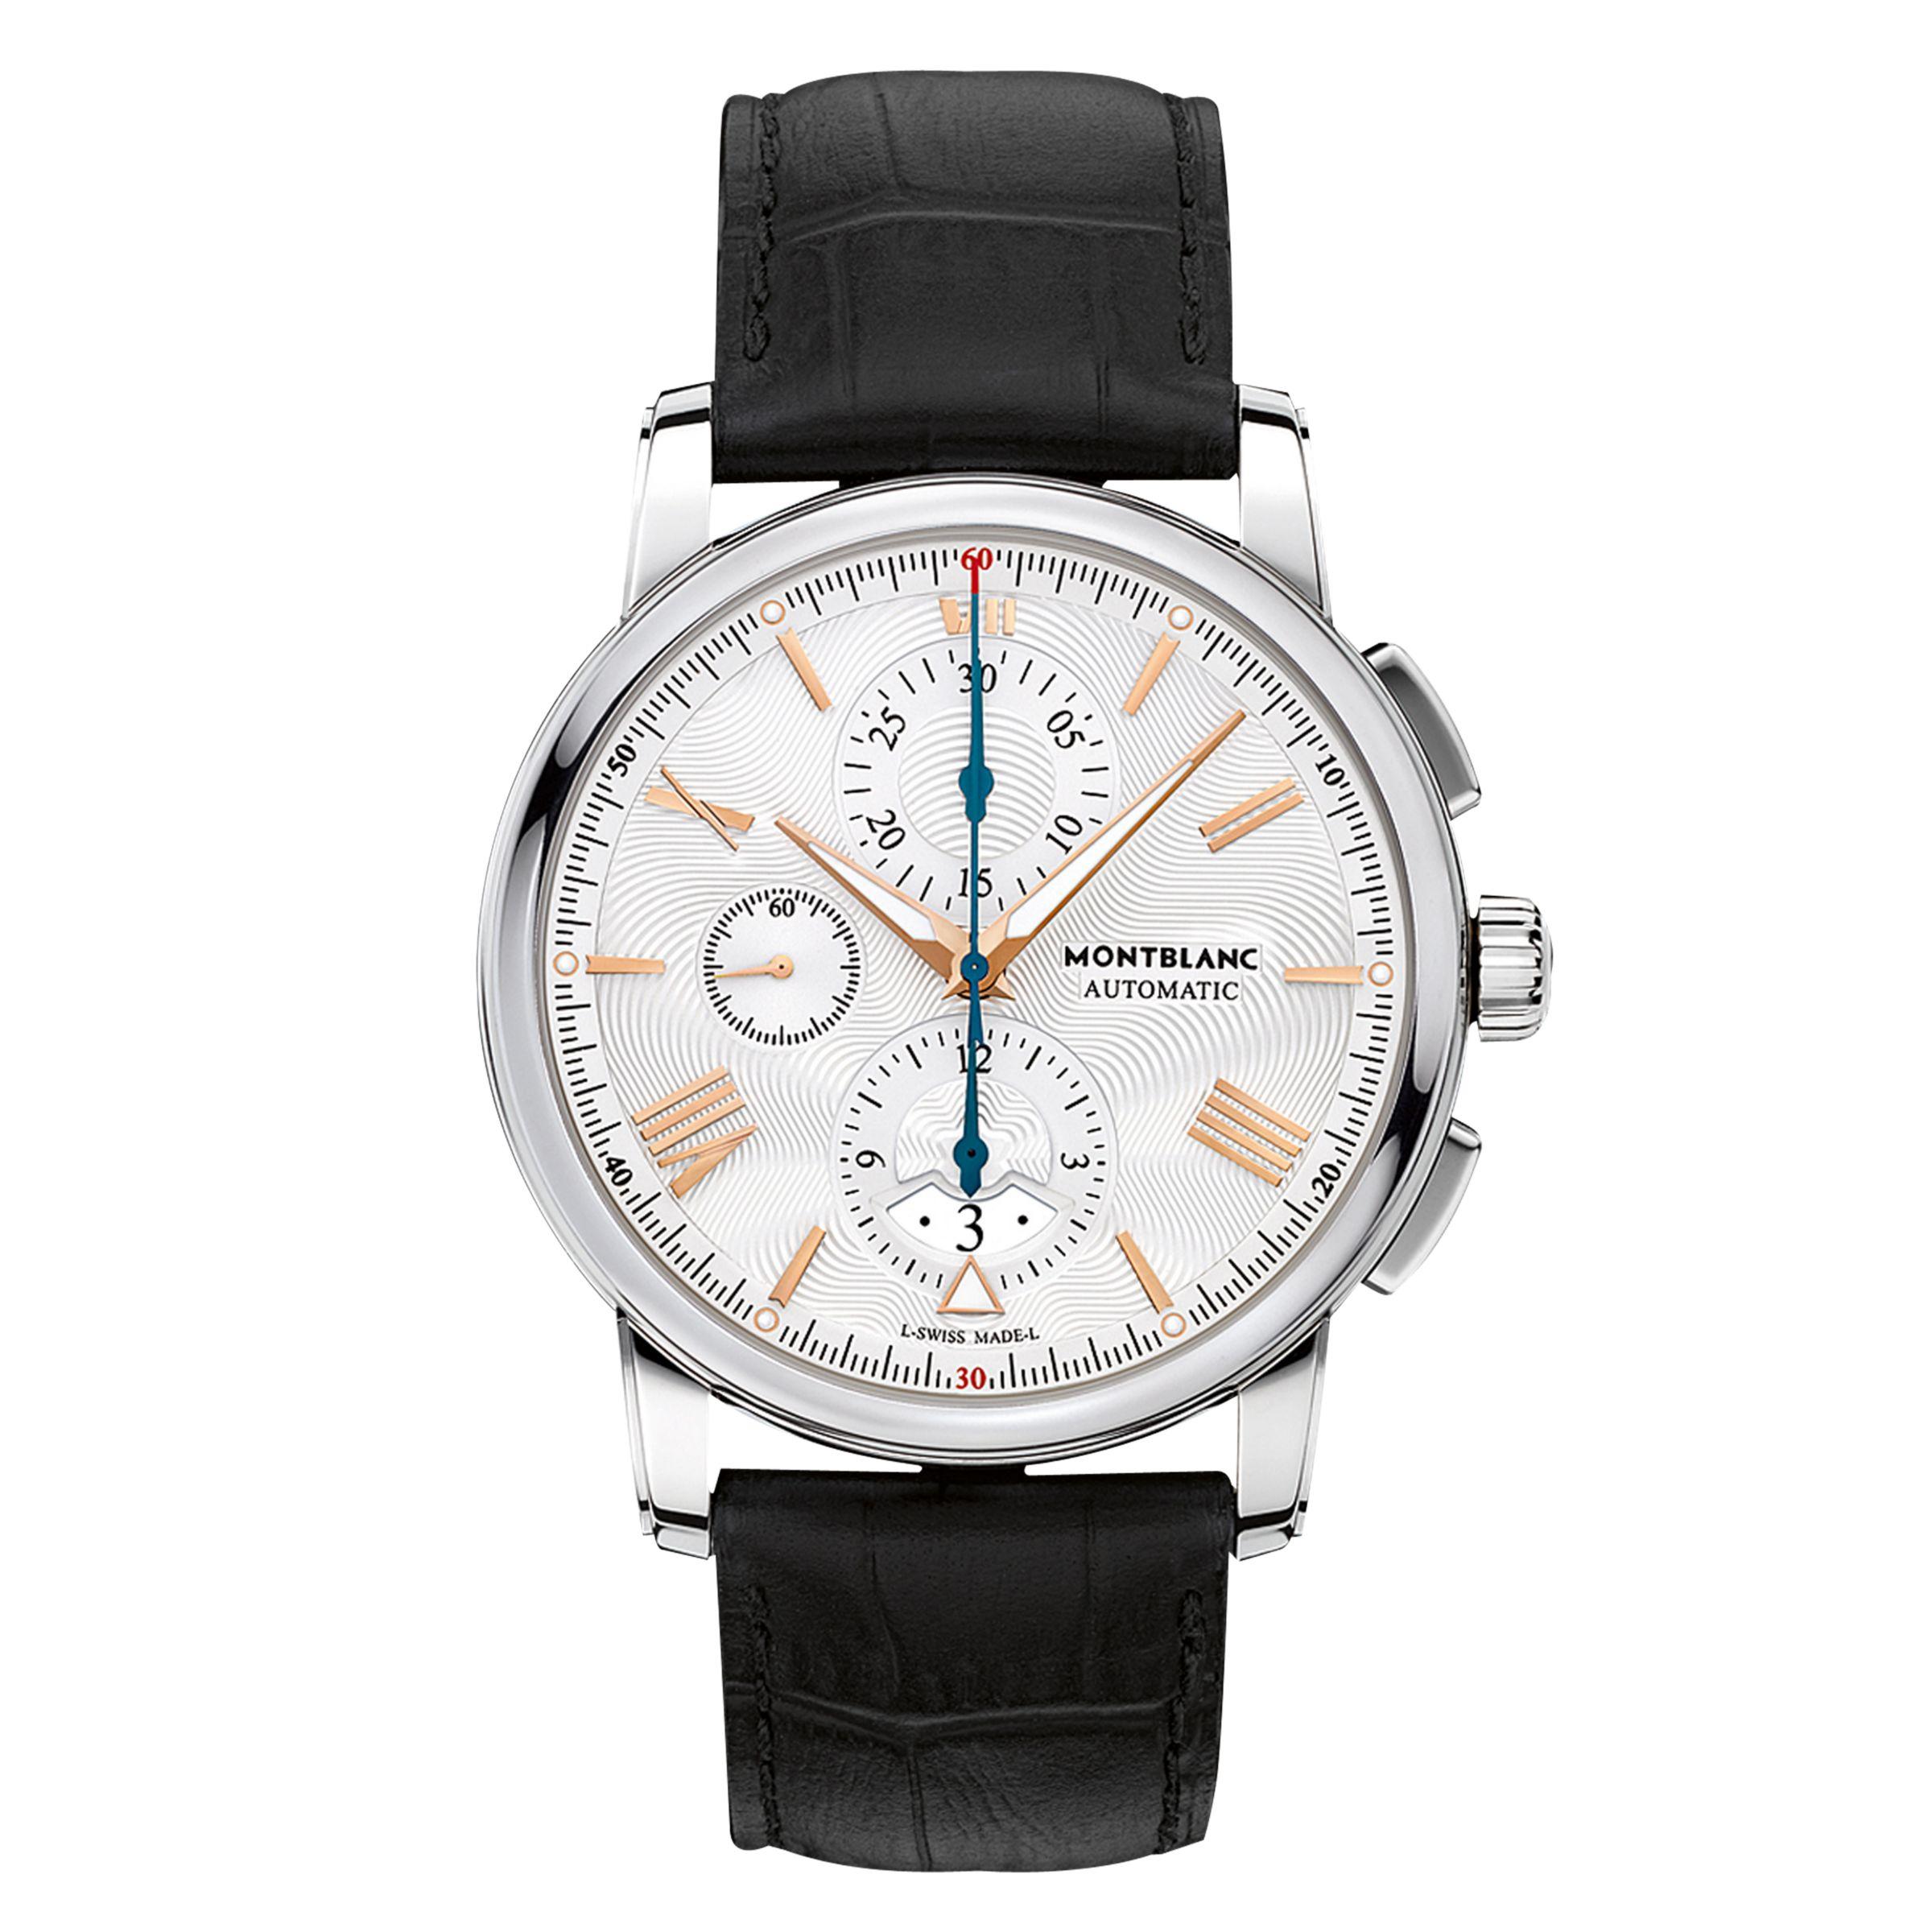 Montblanc Montblanc 114855 Men's 4810 Chronograph Automatic Alligator Leather Strap Watch, Black/Silver